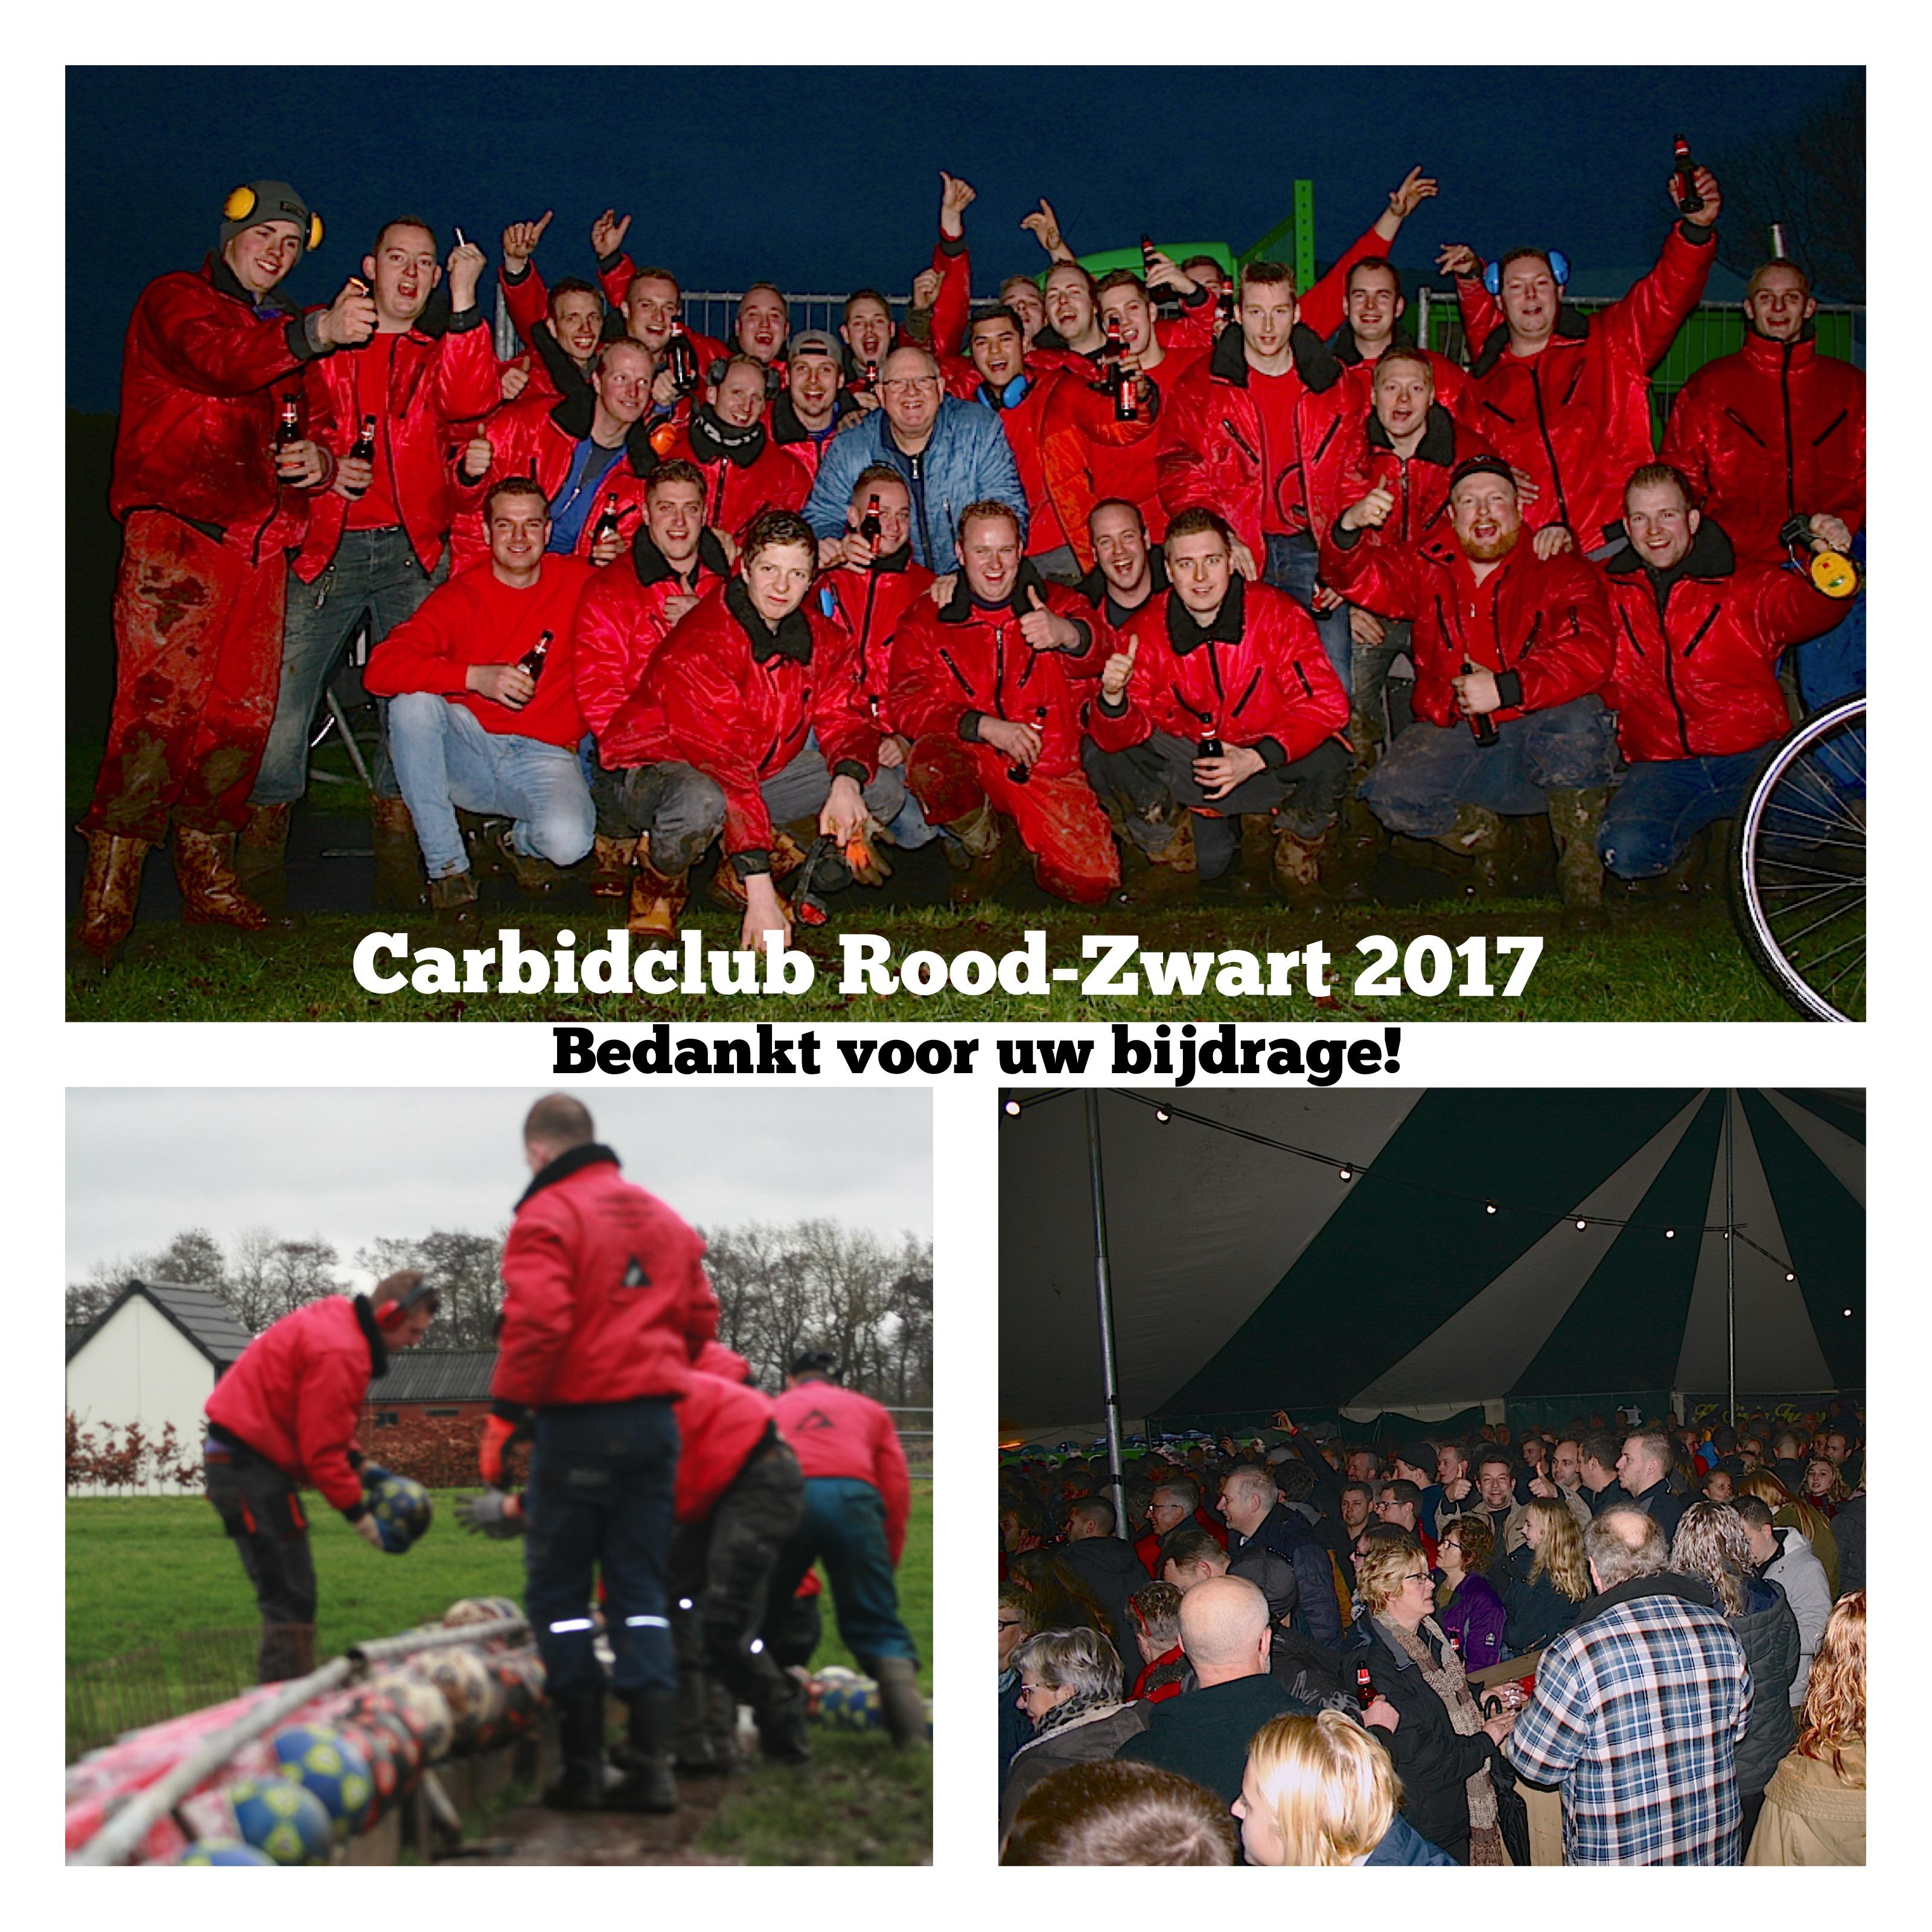 Carbidclub Rood Zwart 2017